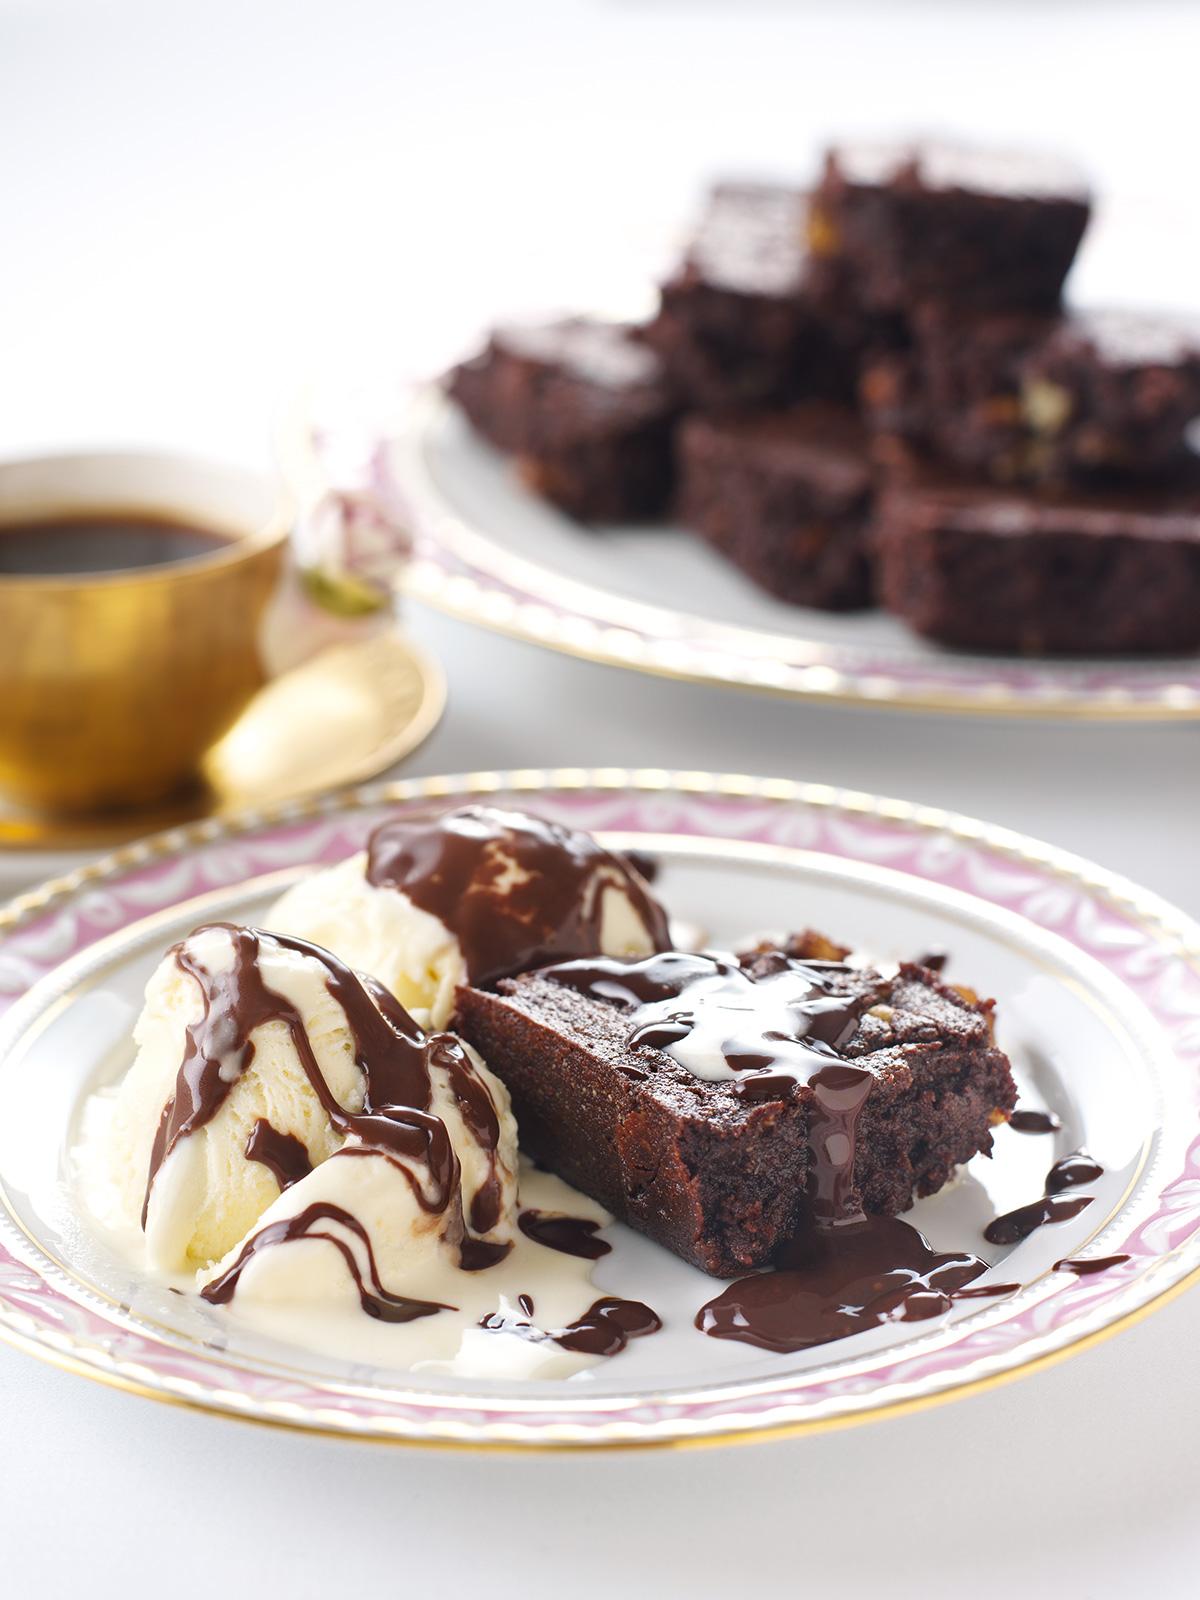 Flourless Chocolate Brownies With Hot Chocolate Sauce